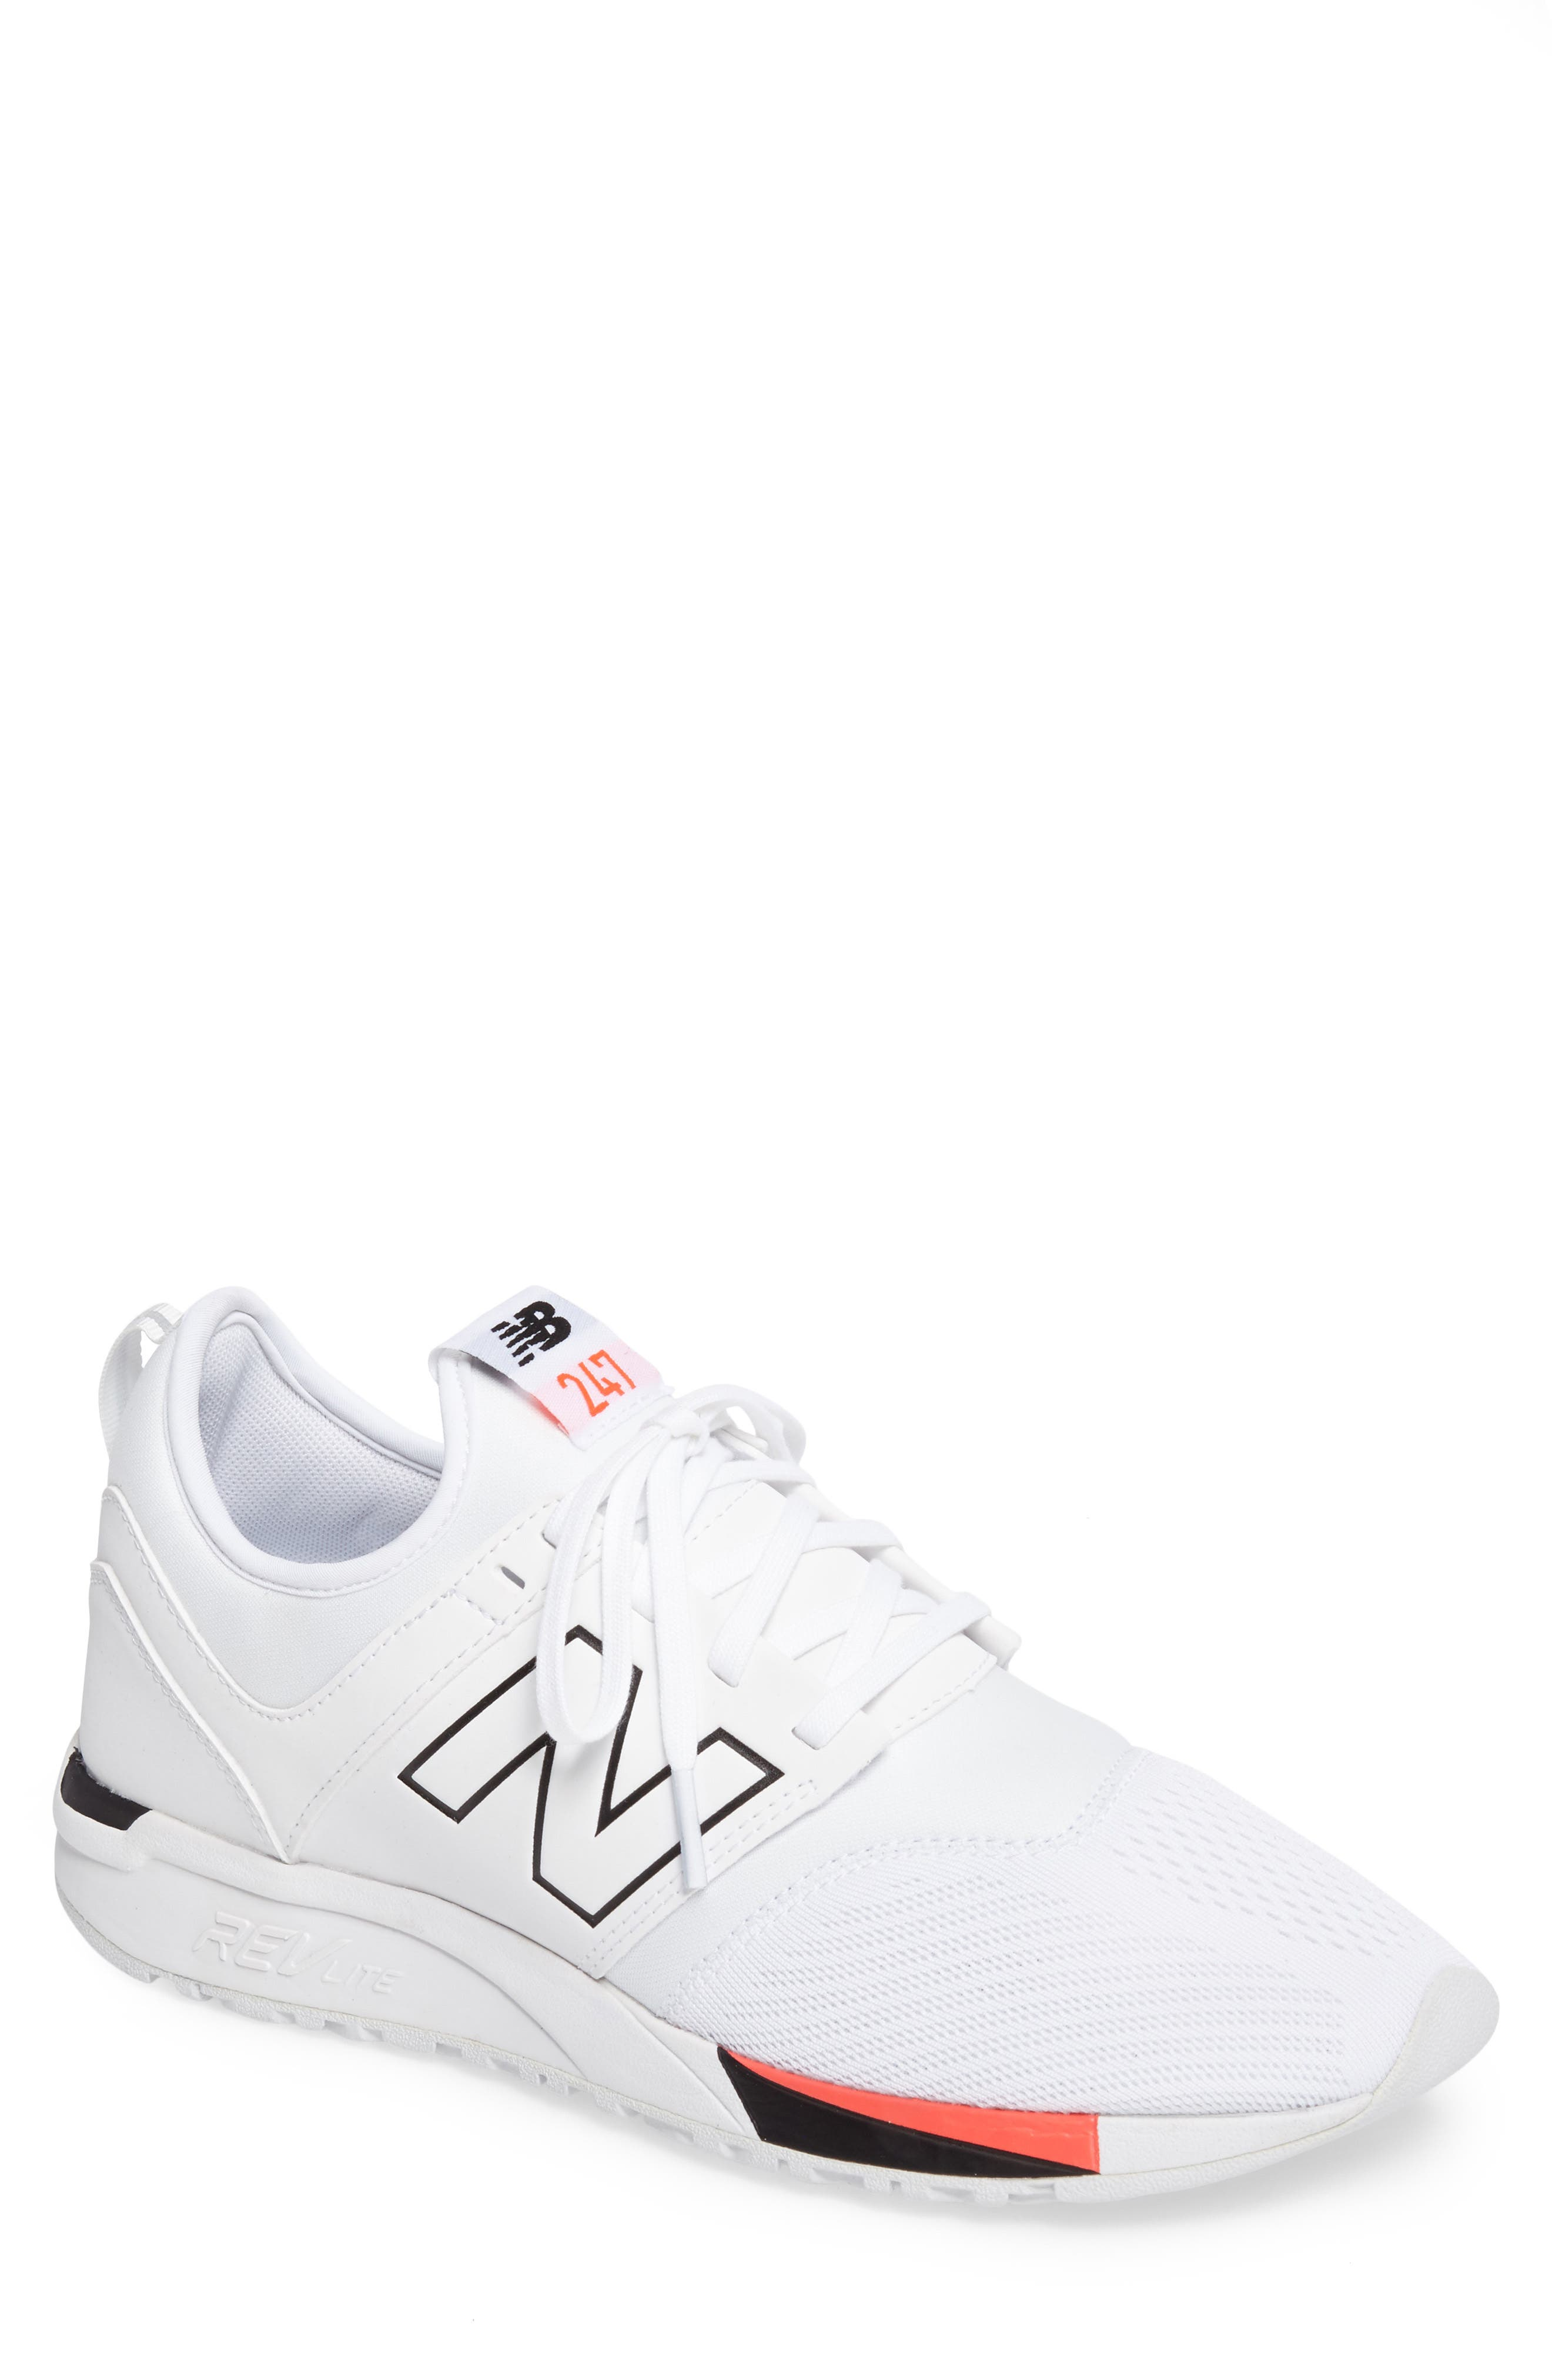 247 Classic Plus Sneaker,                             Main thumbnail 1, color,                             White